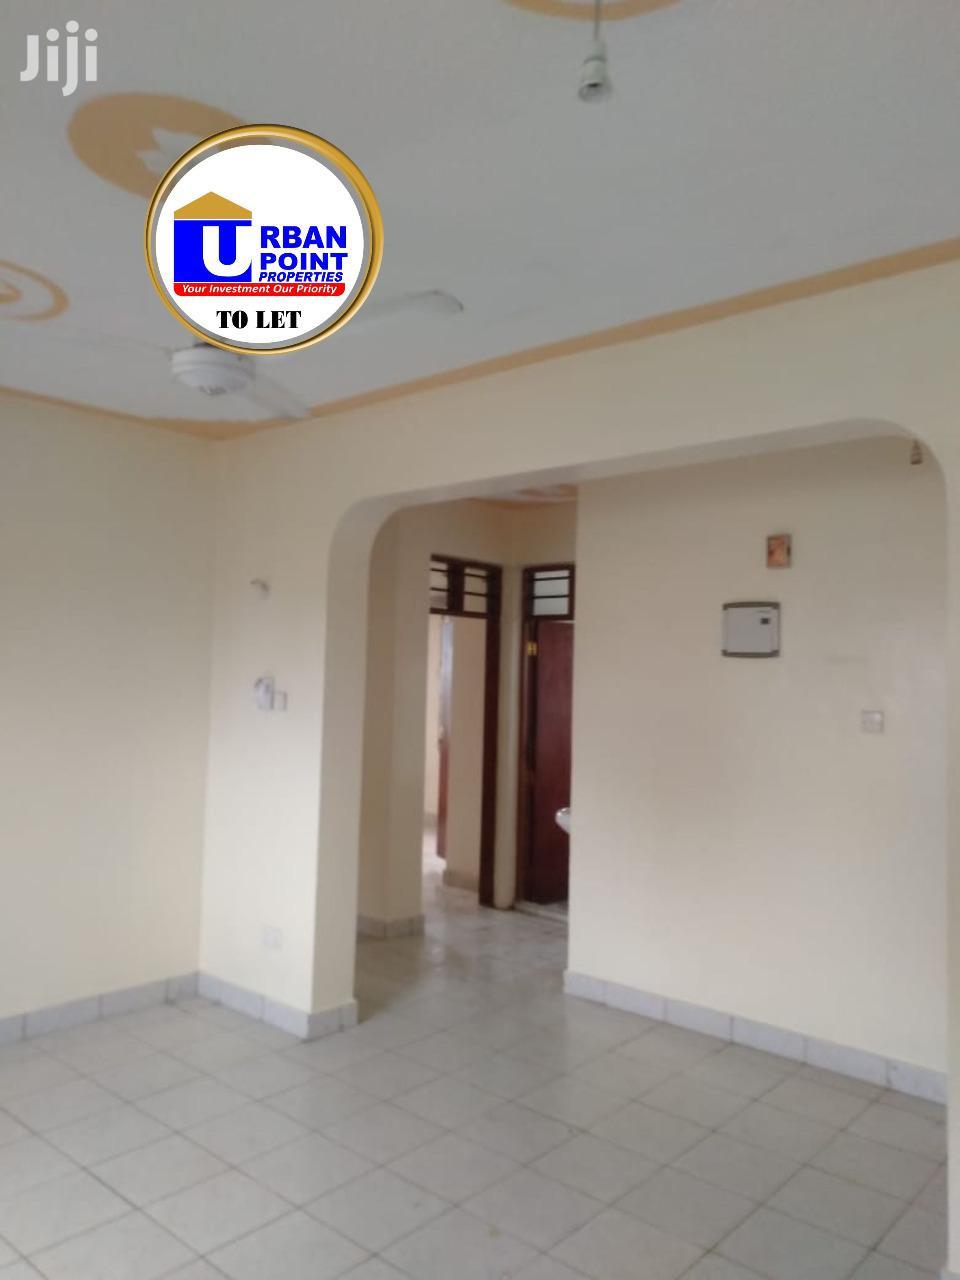 To Let Two Bedroom Apartment In Nyali Mombasa | Houses & Apartments For Rent for sale in Nyali, Mombasa, Kenya